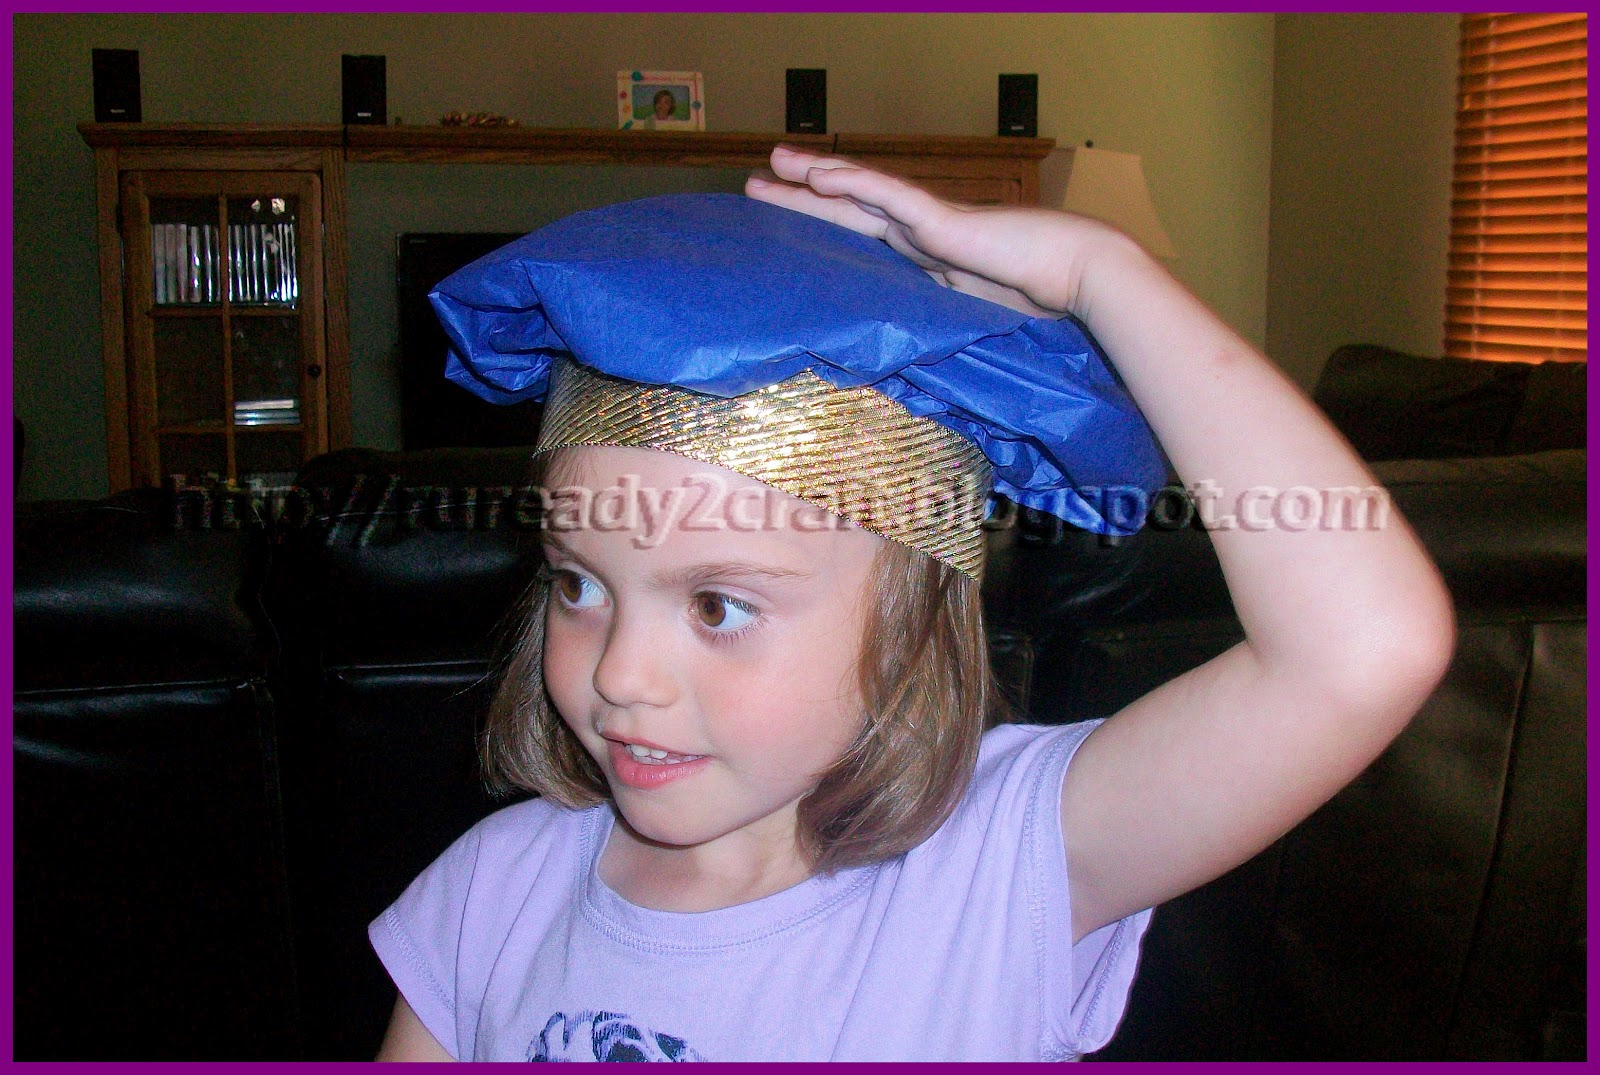 1c536fcbc2da6 RuReady 2 Craft   Chef or Artist Beret or Genie Costume Hats for Fun!